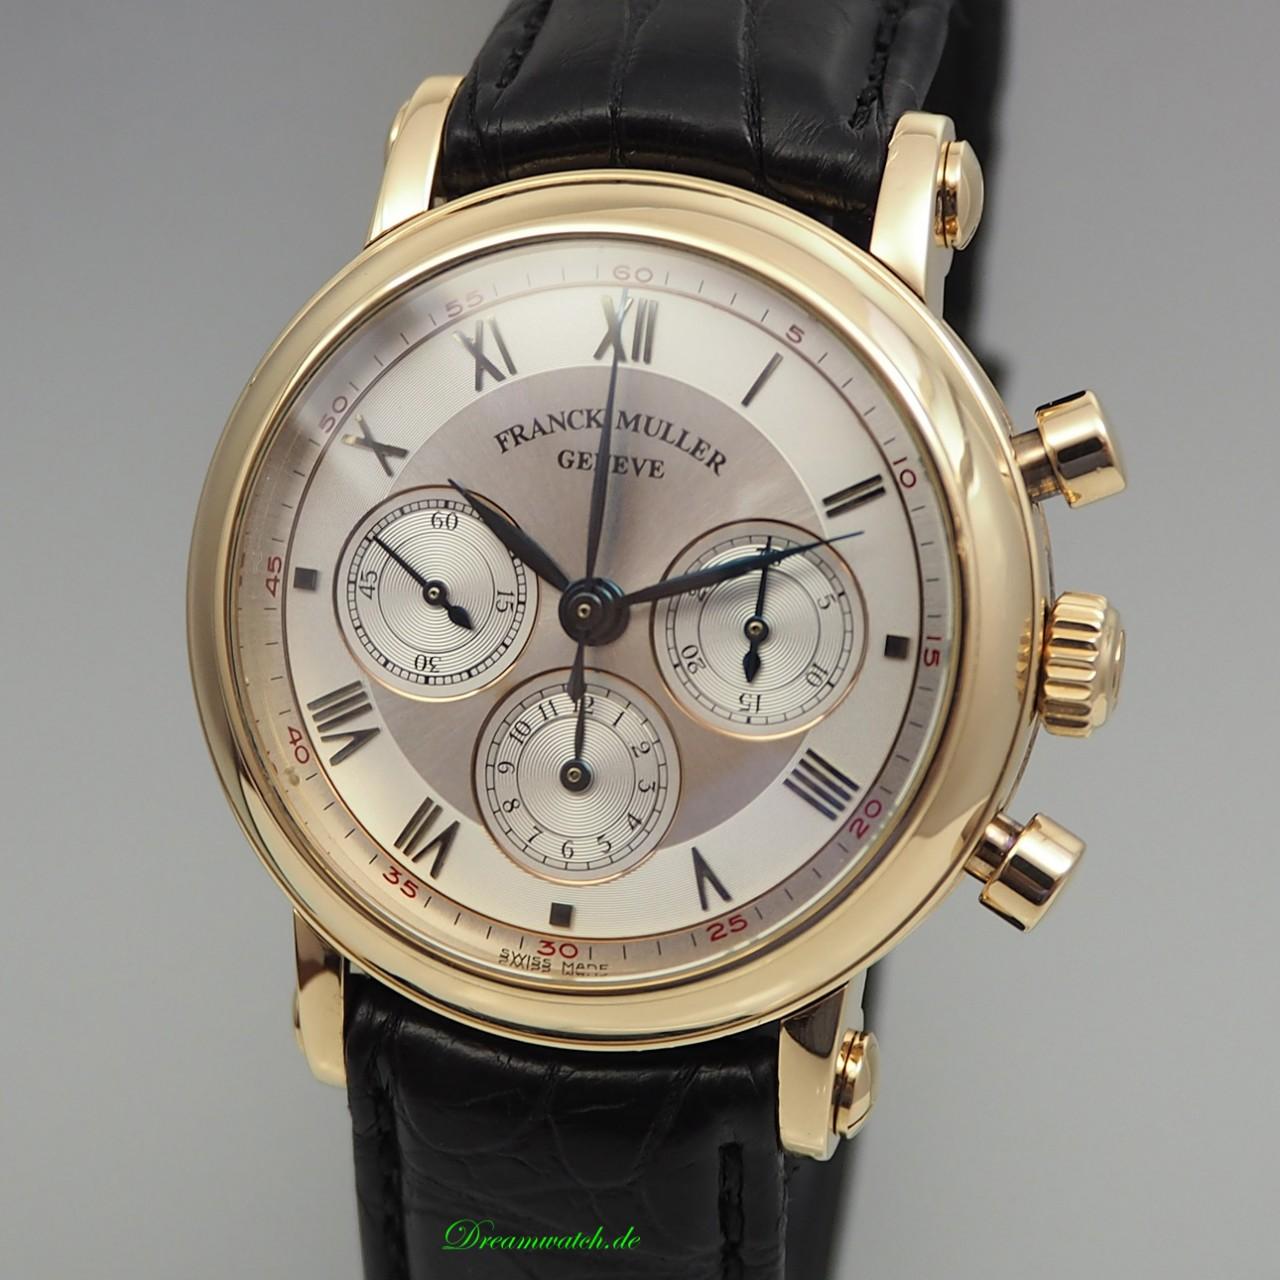 Franck Muller Chronograph Ronde 3870 NA, Gold18k/750 Handaufzug Lemania, B+P